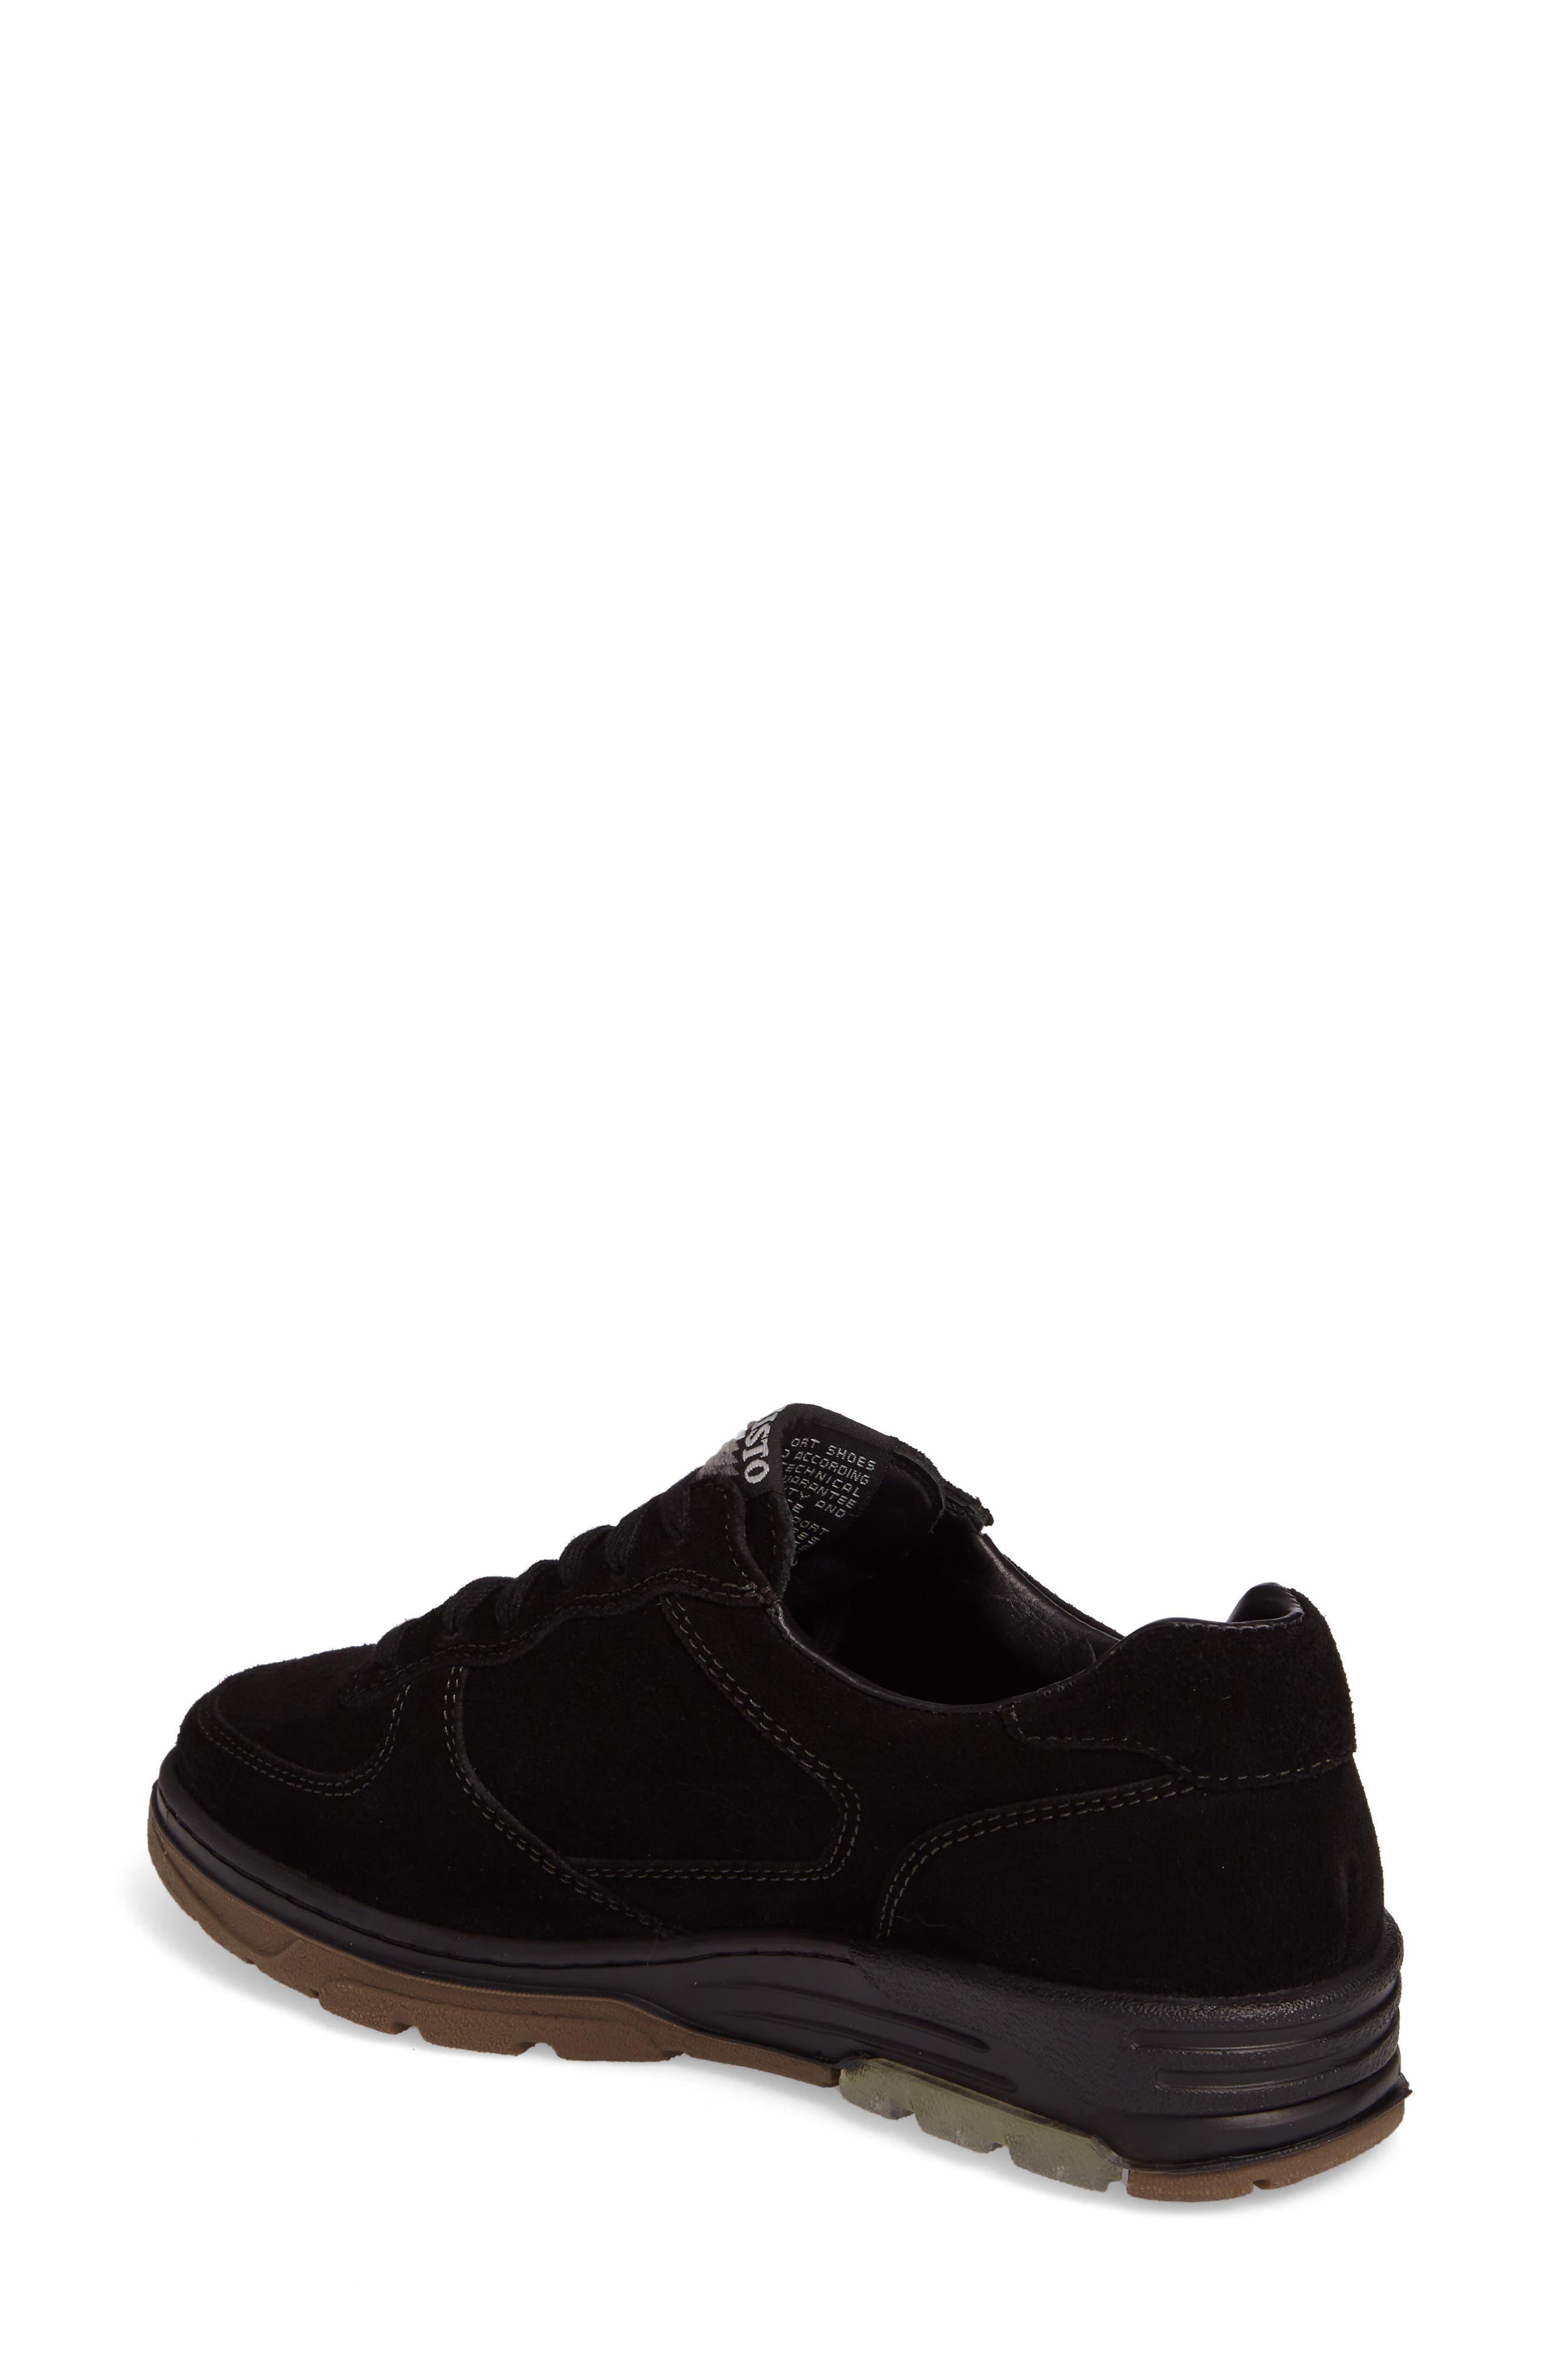 Nykita Sneaker,                             Alternate thumbnail 2, color,                             BLACK SUEDE